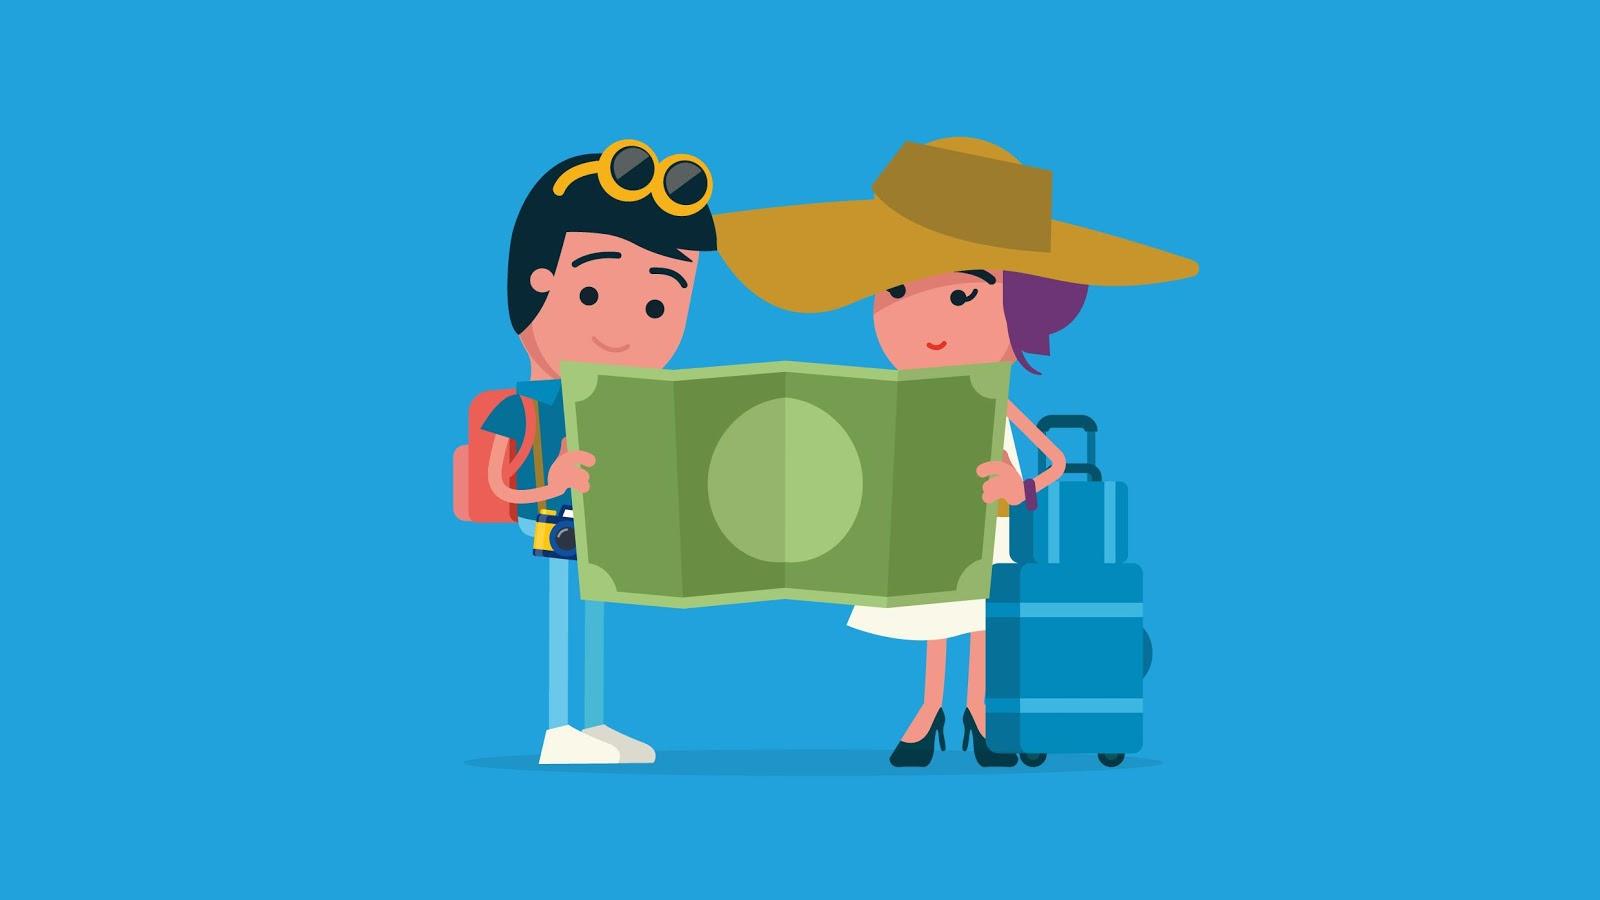 Berwisata Ke Luar Negeri Dengan Jenius